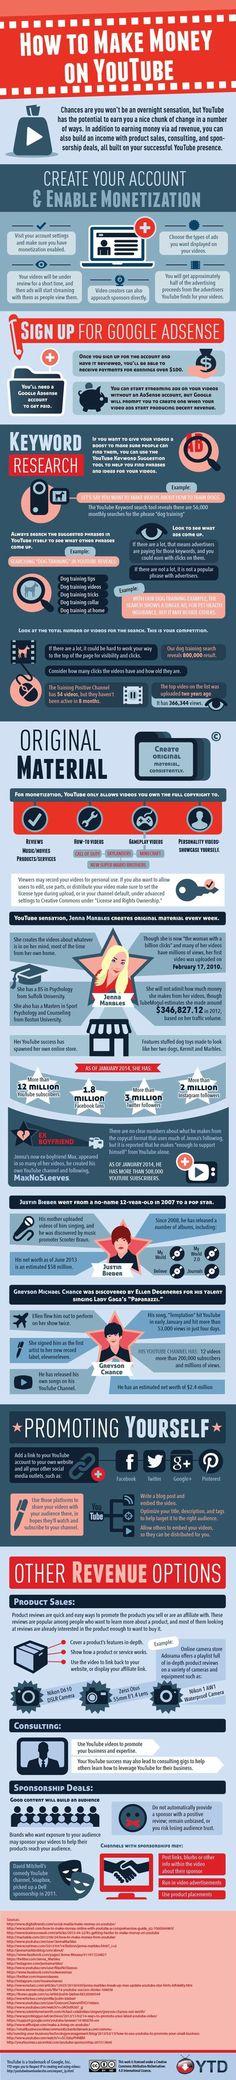 How to Make Money on YouTube? #Infographic | via #BornToBeSocial - Pinterest Marketing: